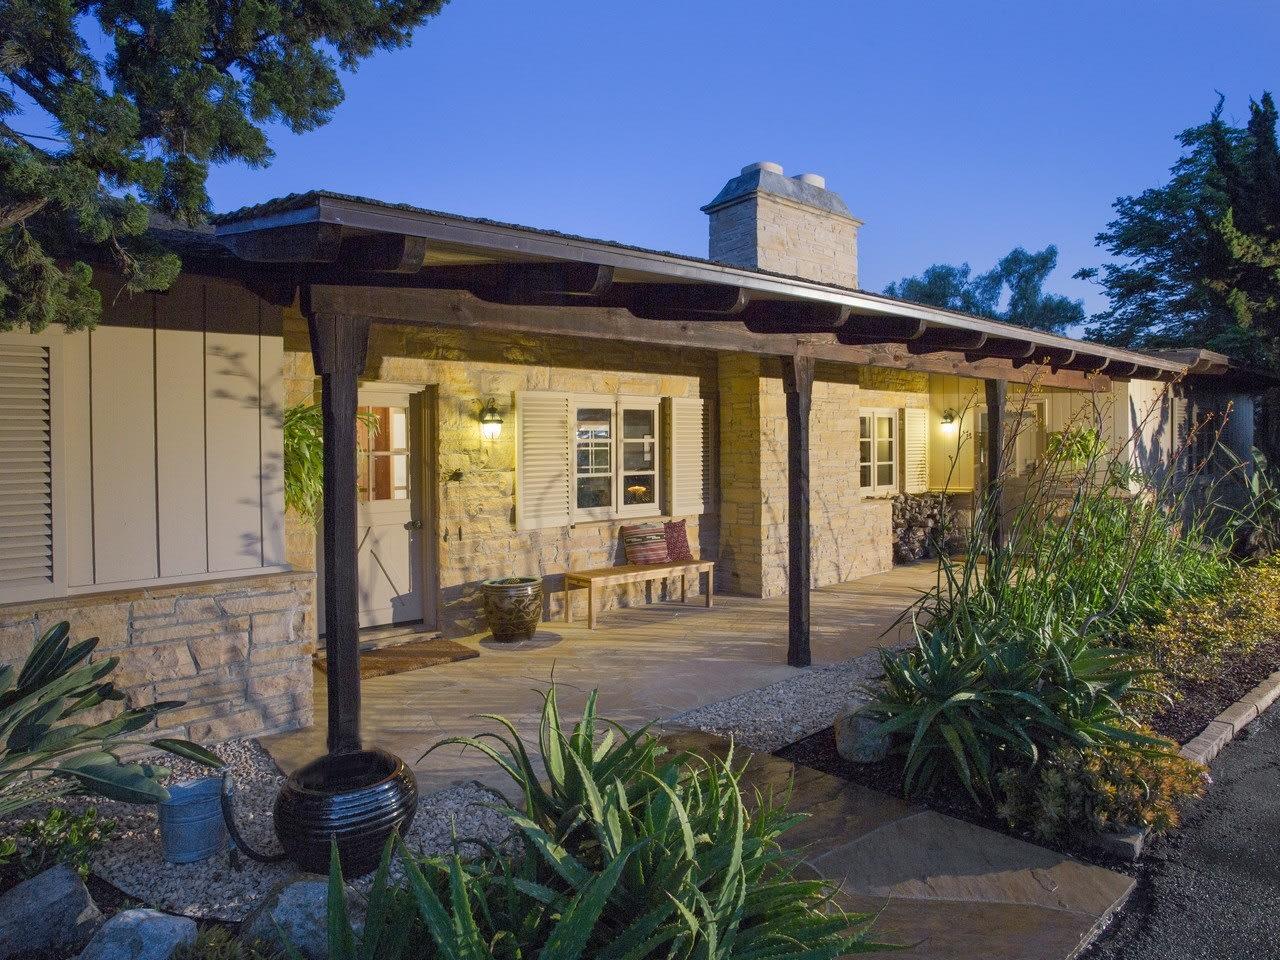 5770 El Montevideo, Rancho Santa Fe, CA 92067 video preview